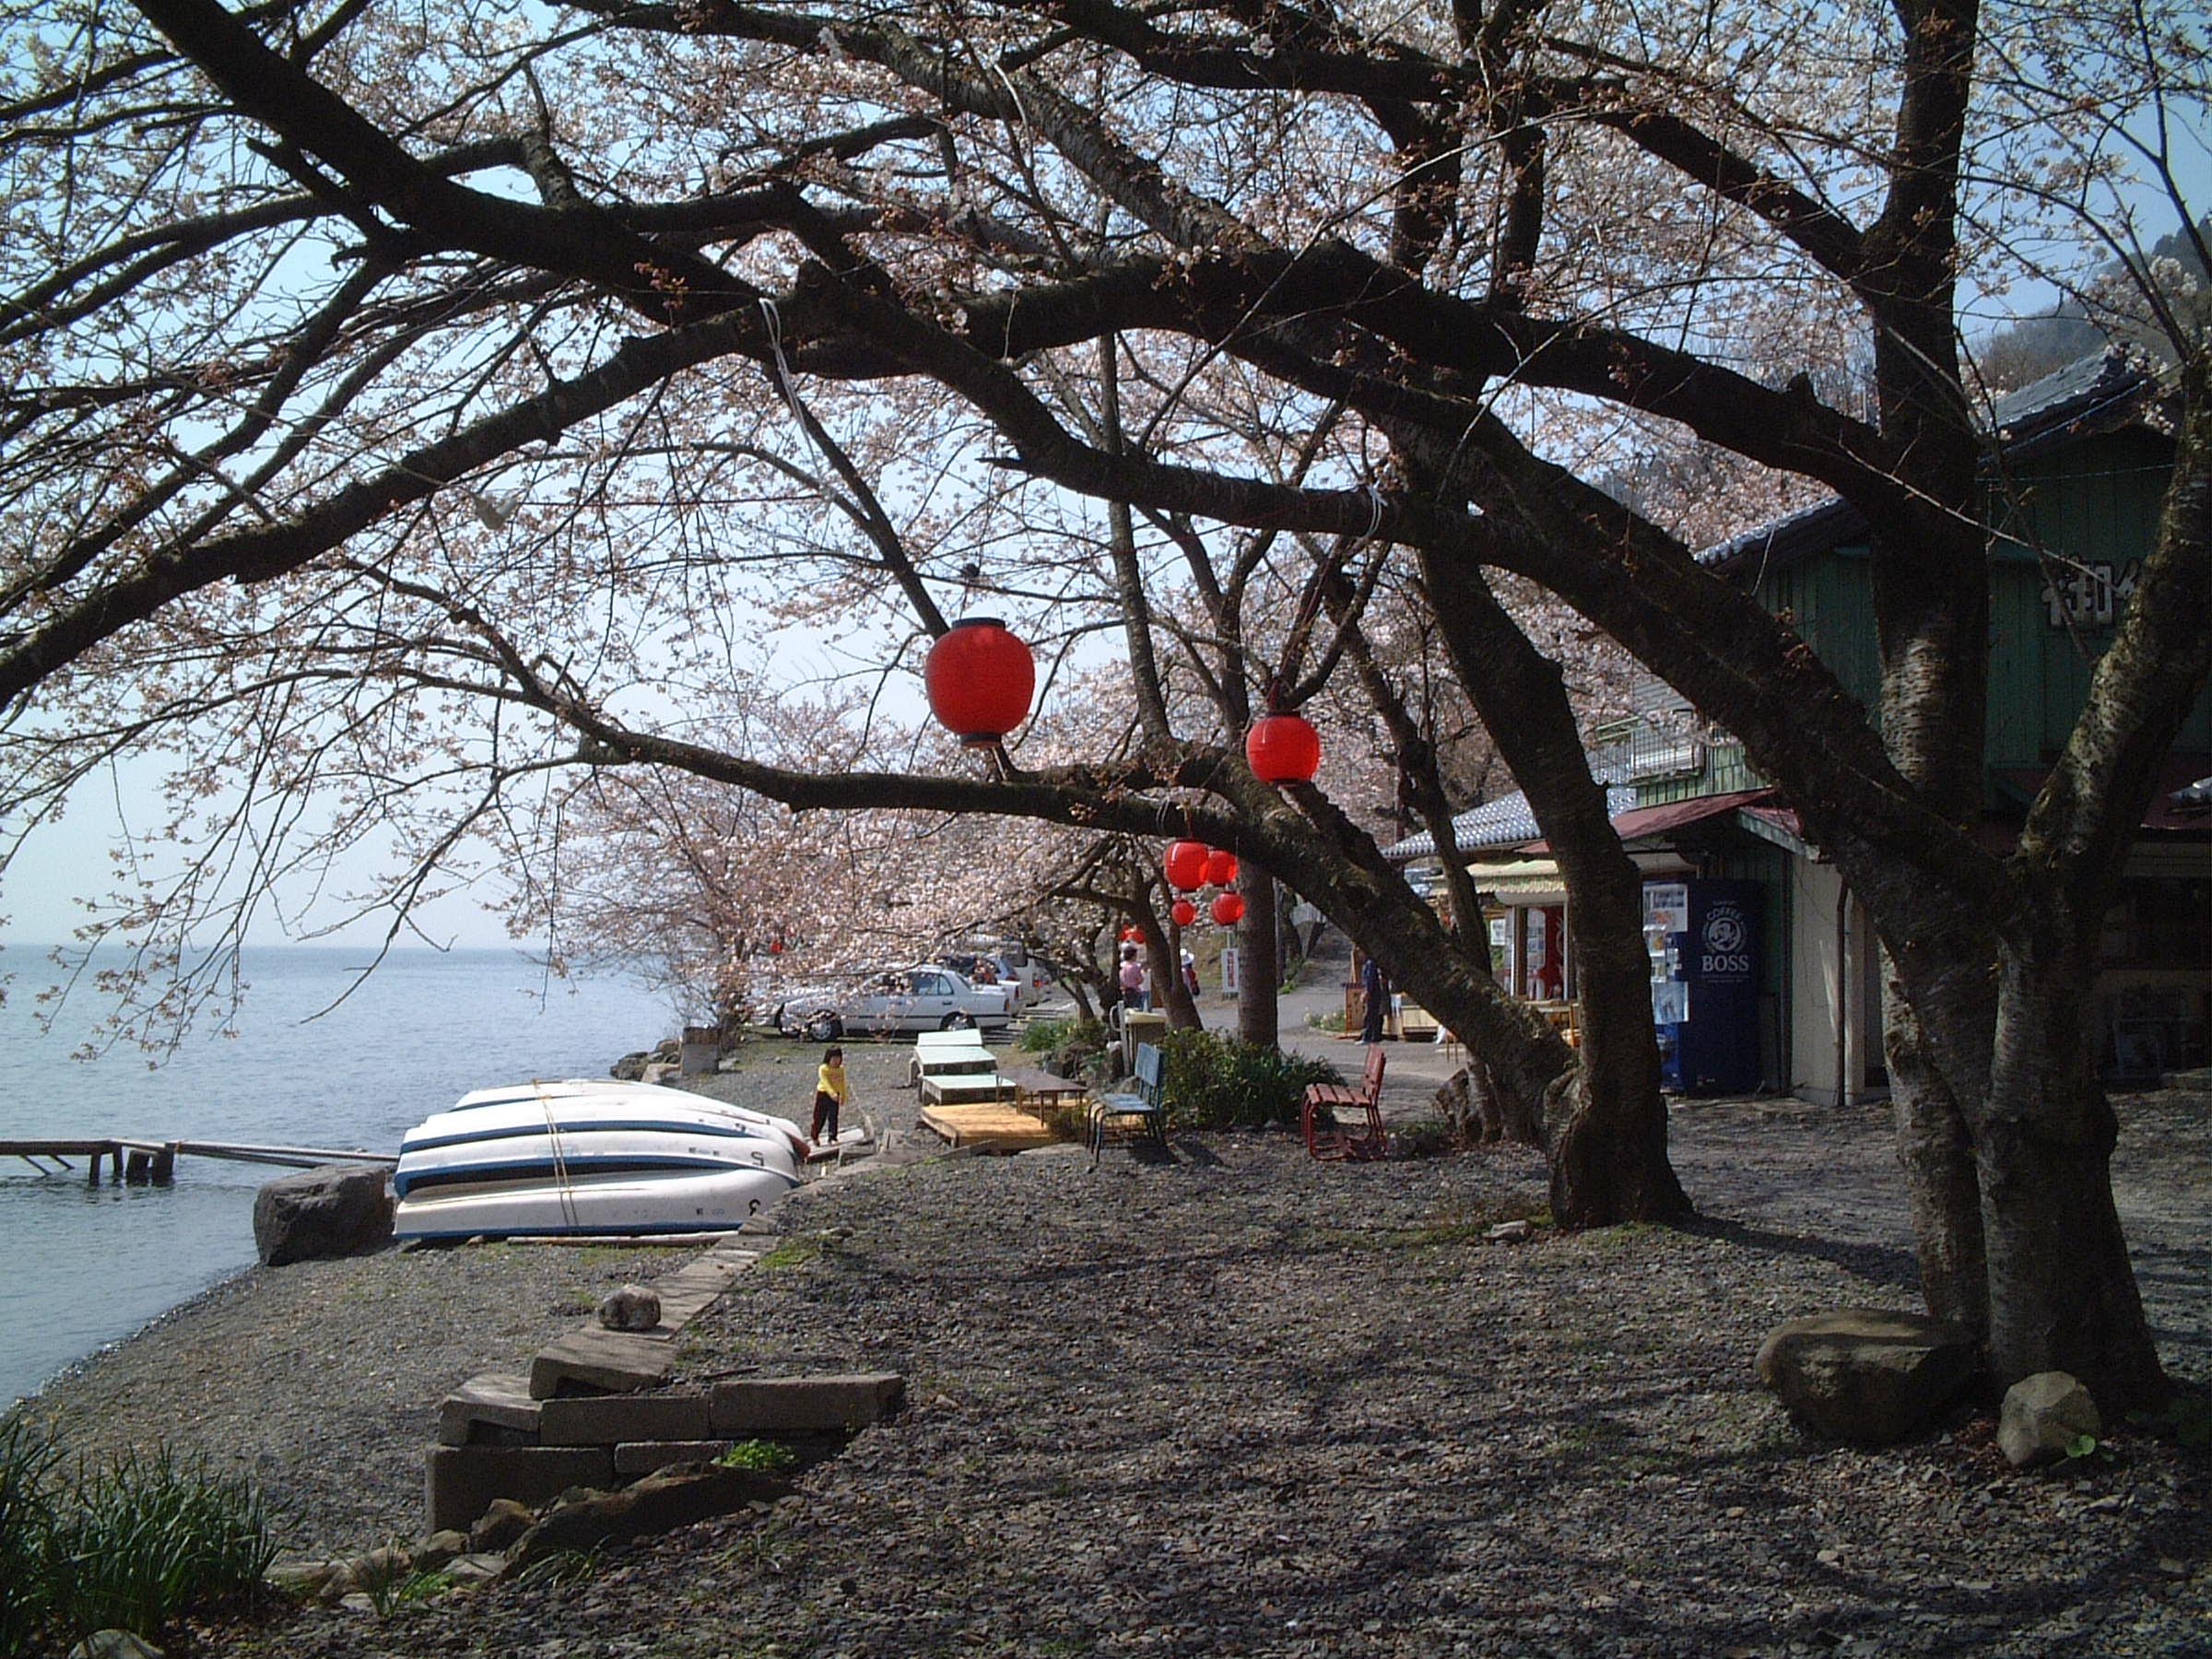 Nihonmatsu Campground